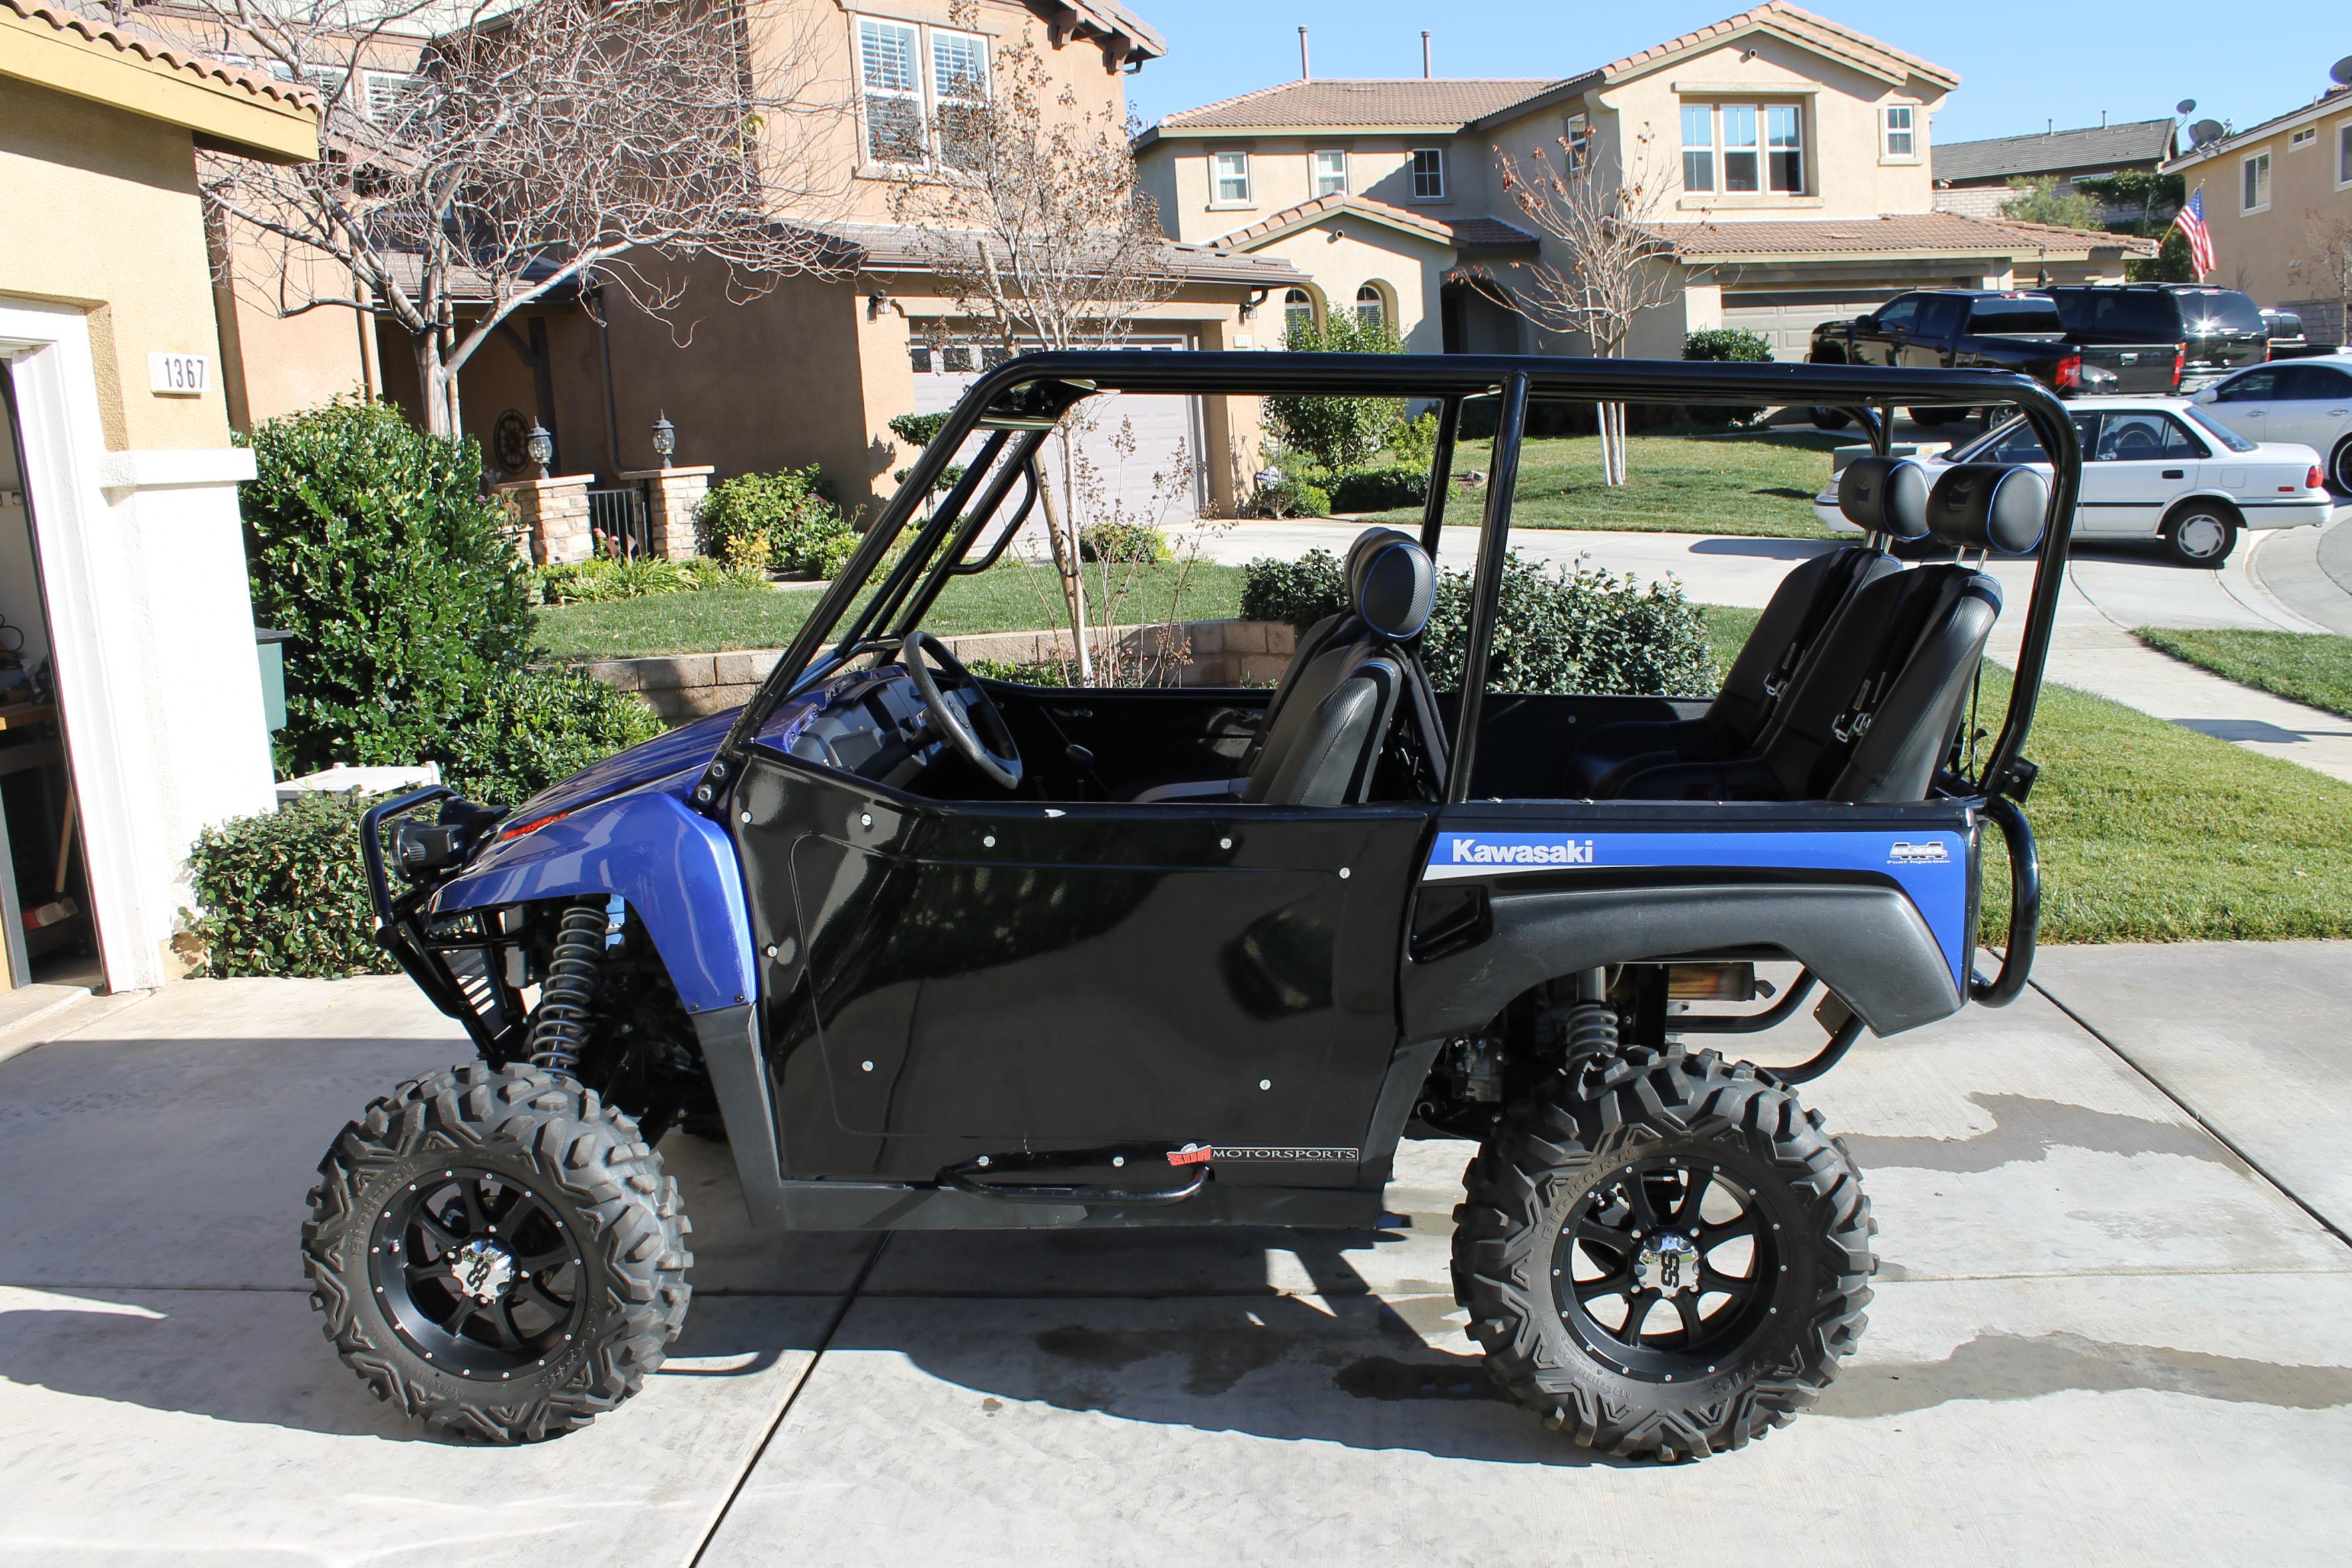 2009 kawasaki teryx street legal 4 seater +6lt sdr built $14,000